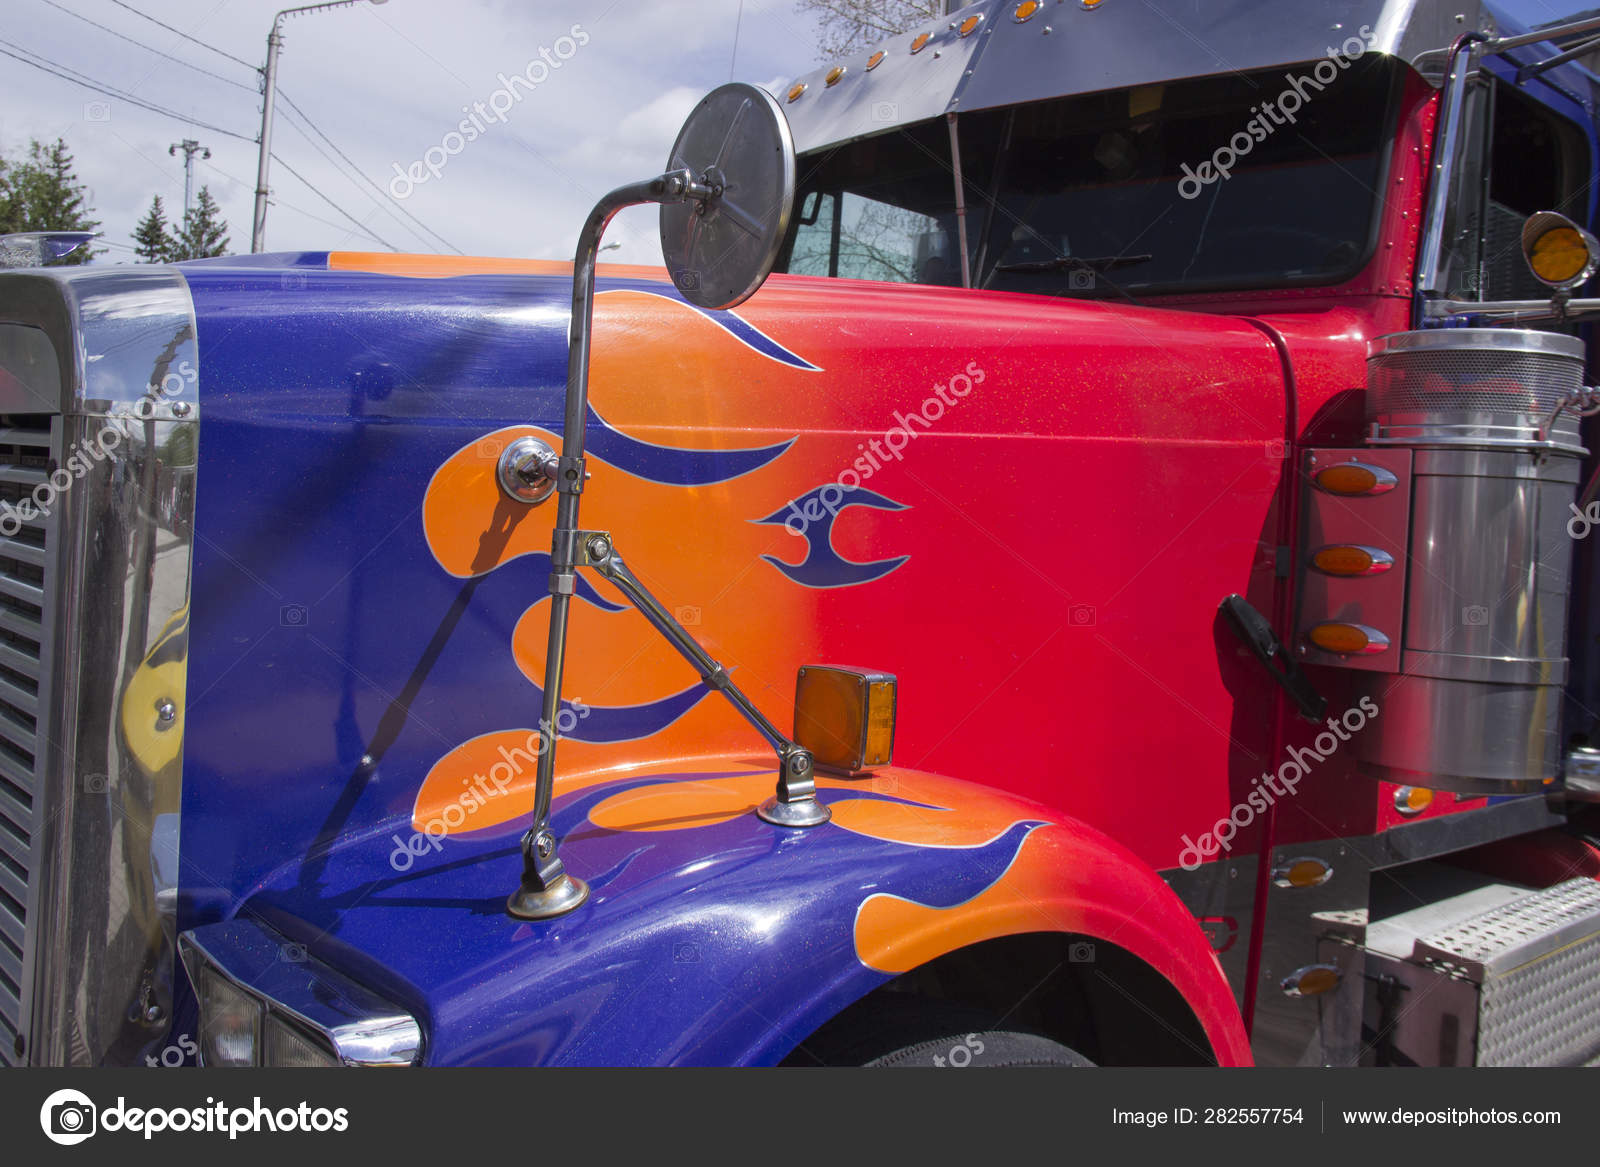 Russia, Krasnoyarsk, June 2019: Truck Peterbilt car from the